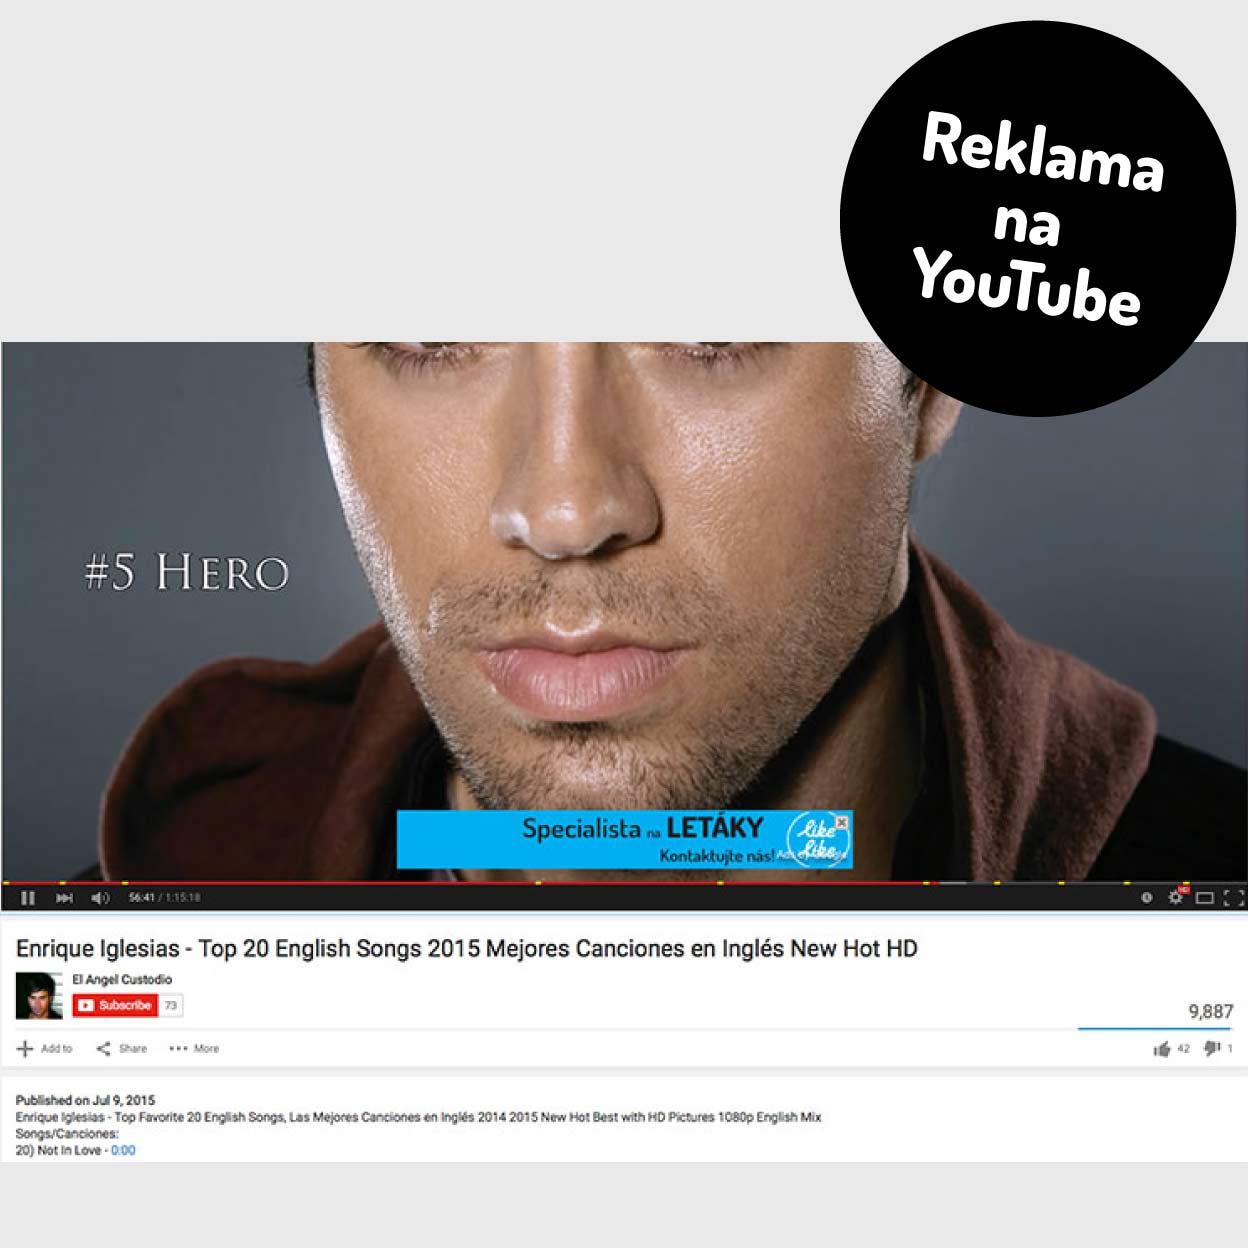 You Tube reklama